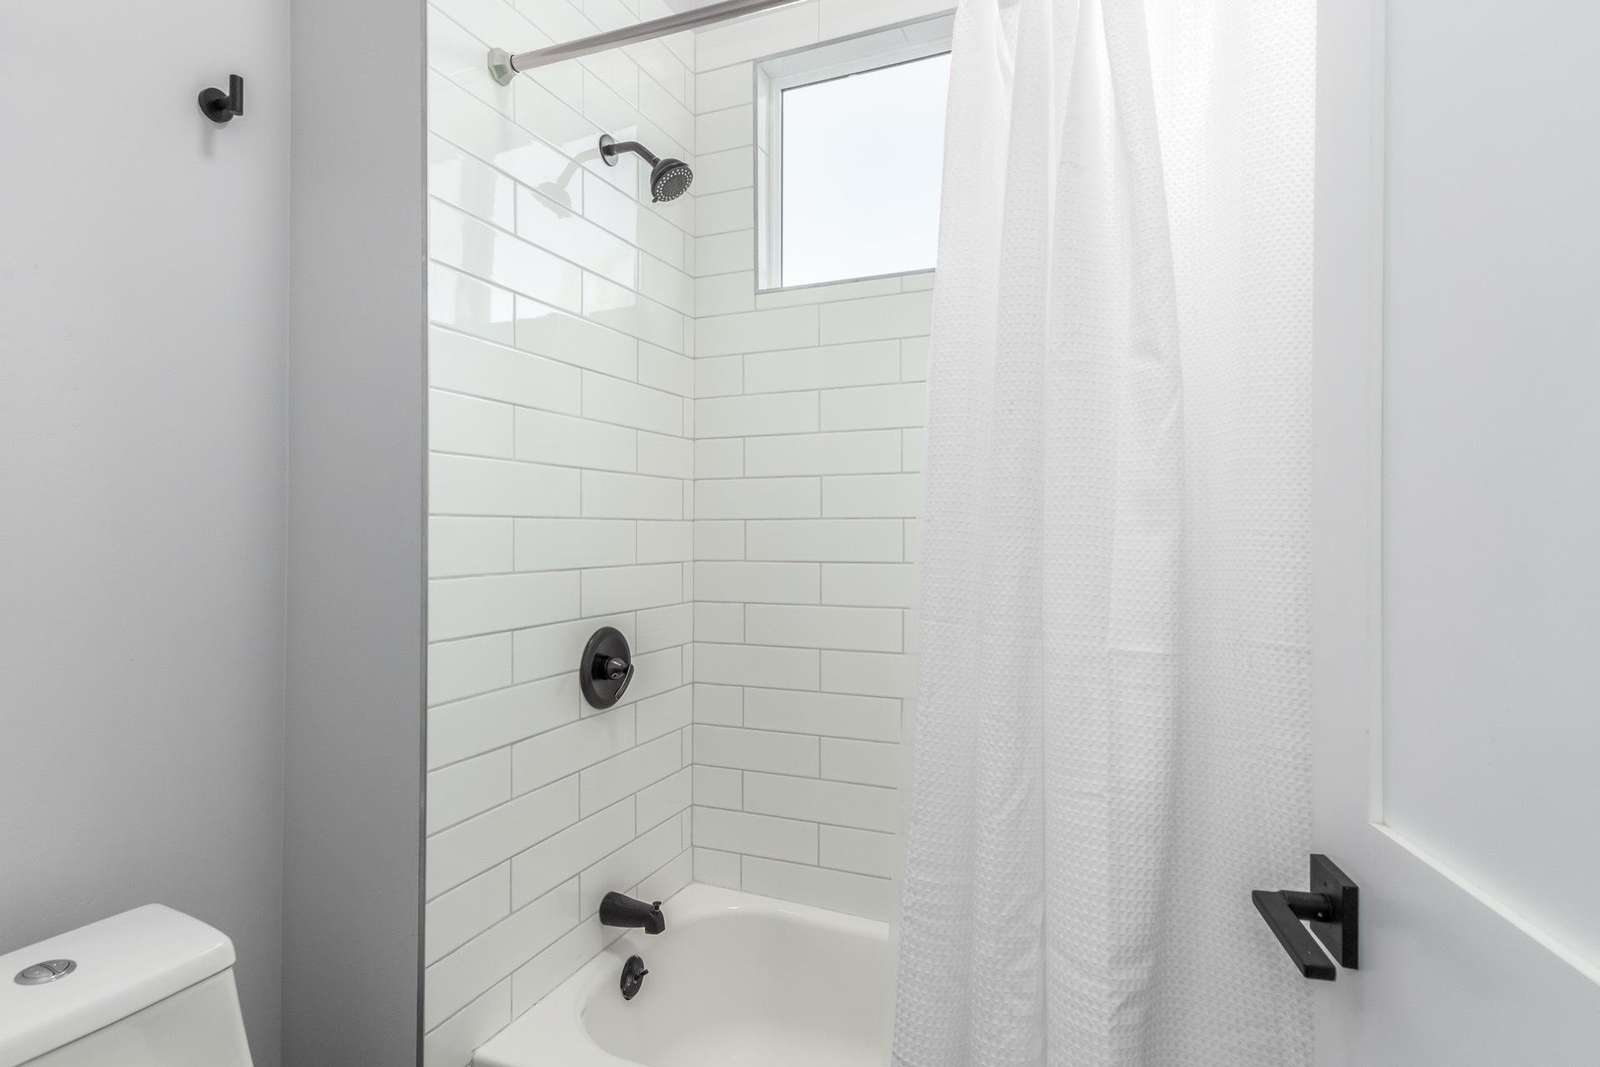 Jack & Jill Toilet - Bath Tub Shower Closet.